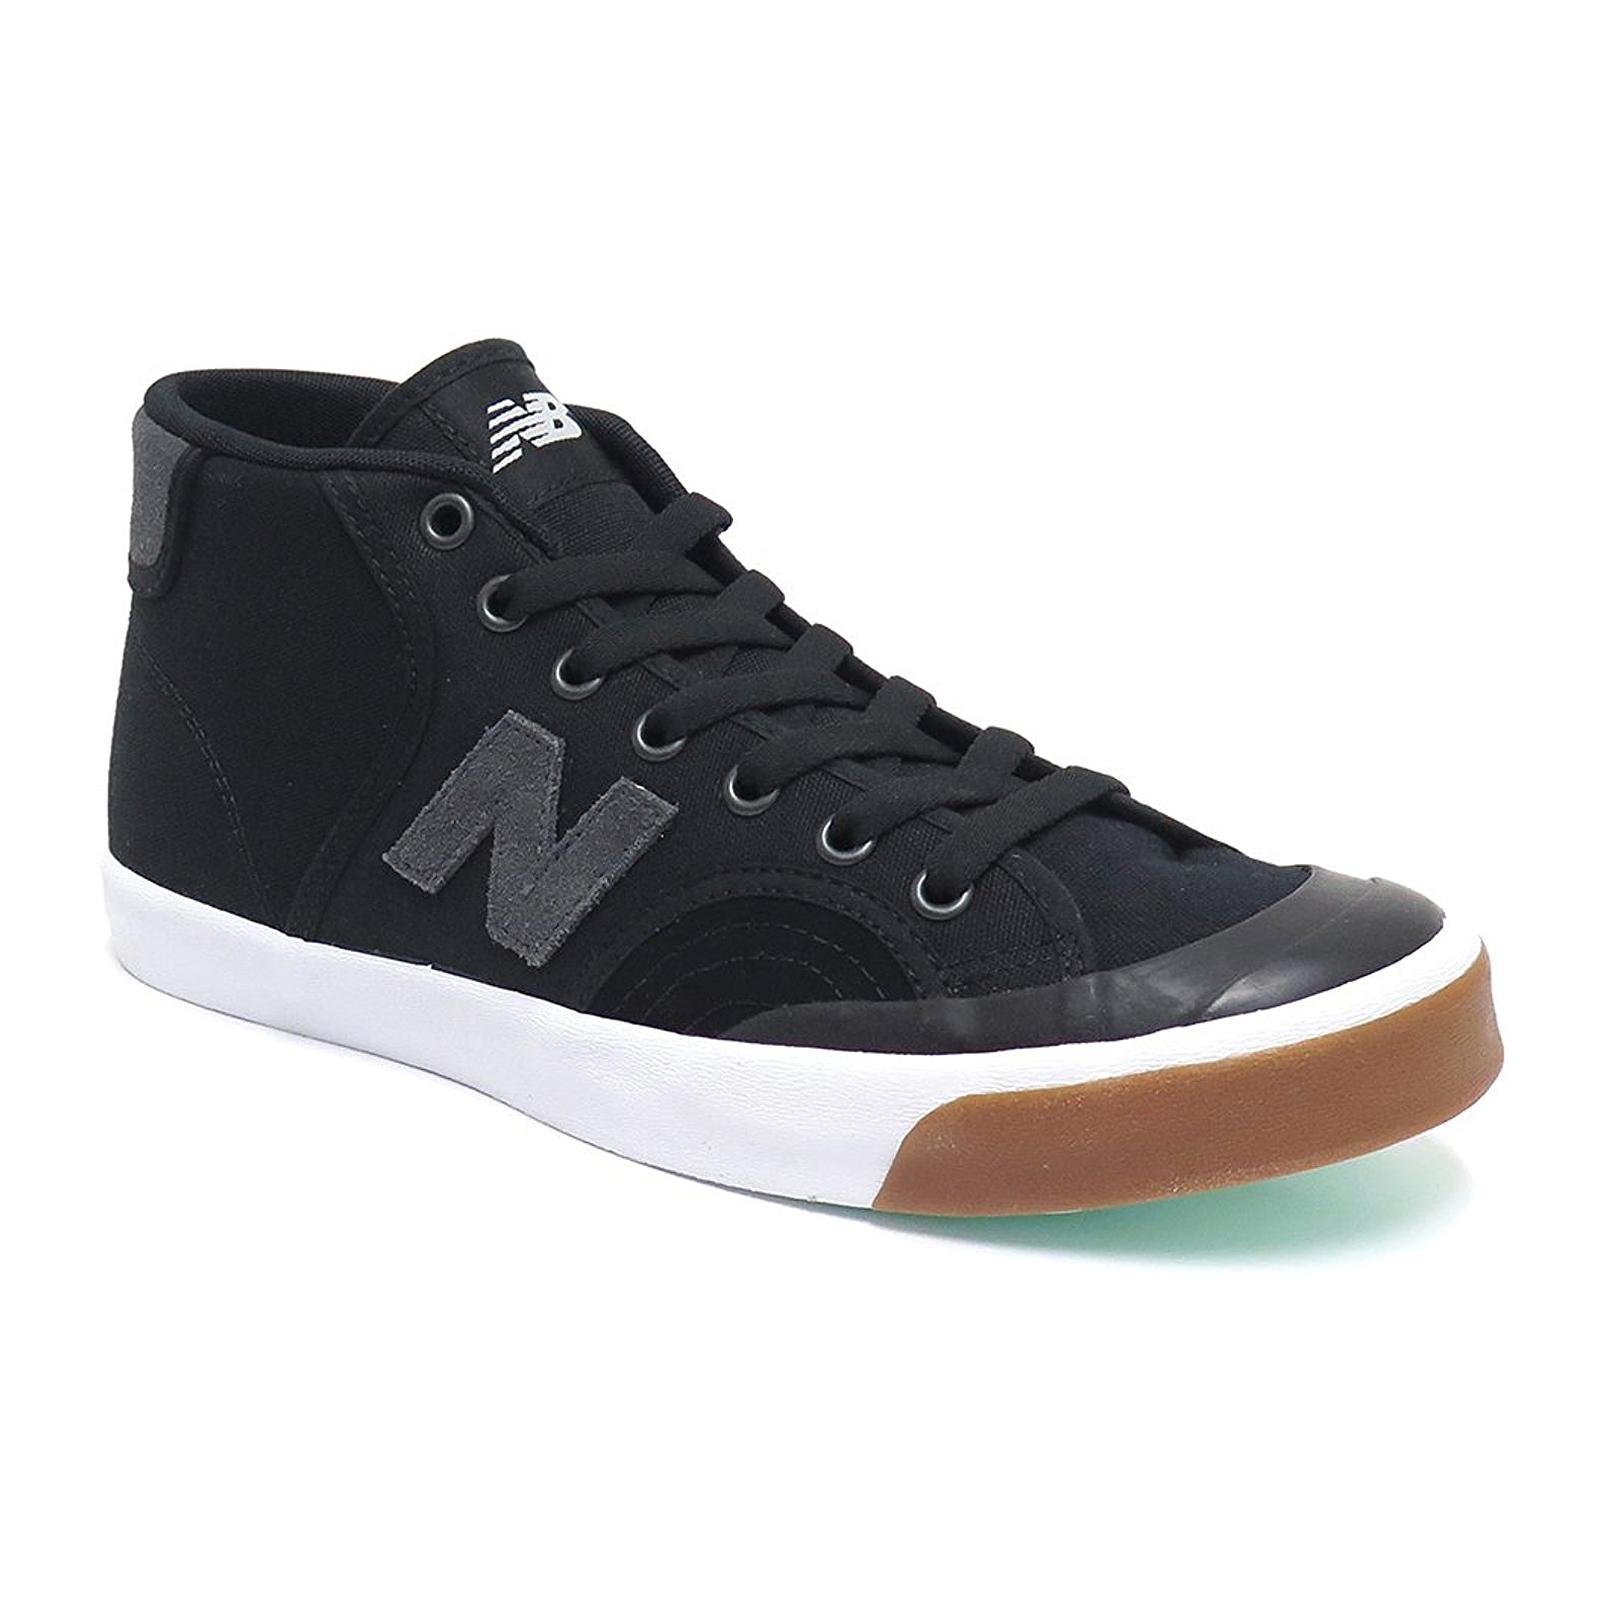 New Balance Sneakers Numeric Skateboarding BlackGrey Canvas